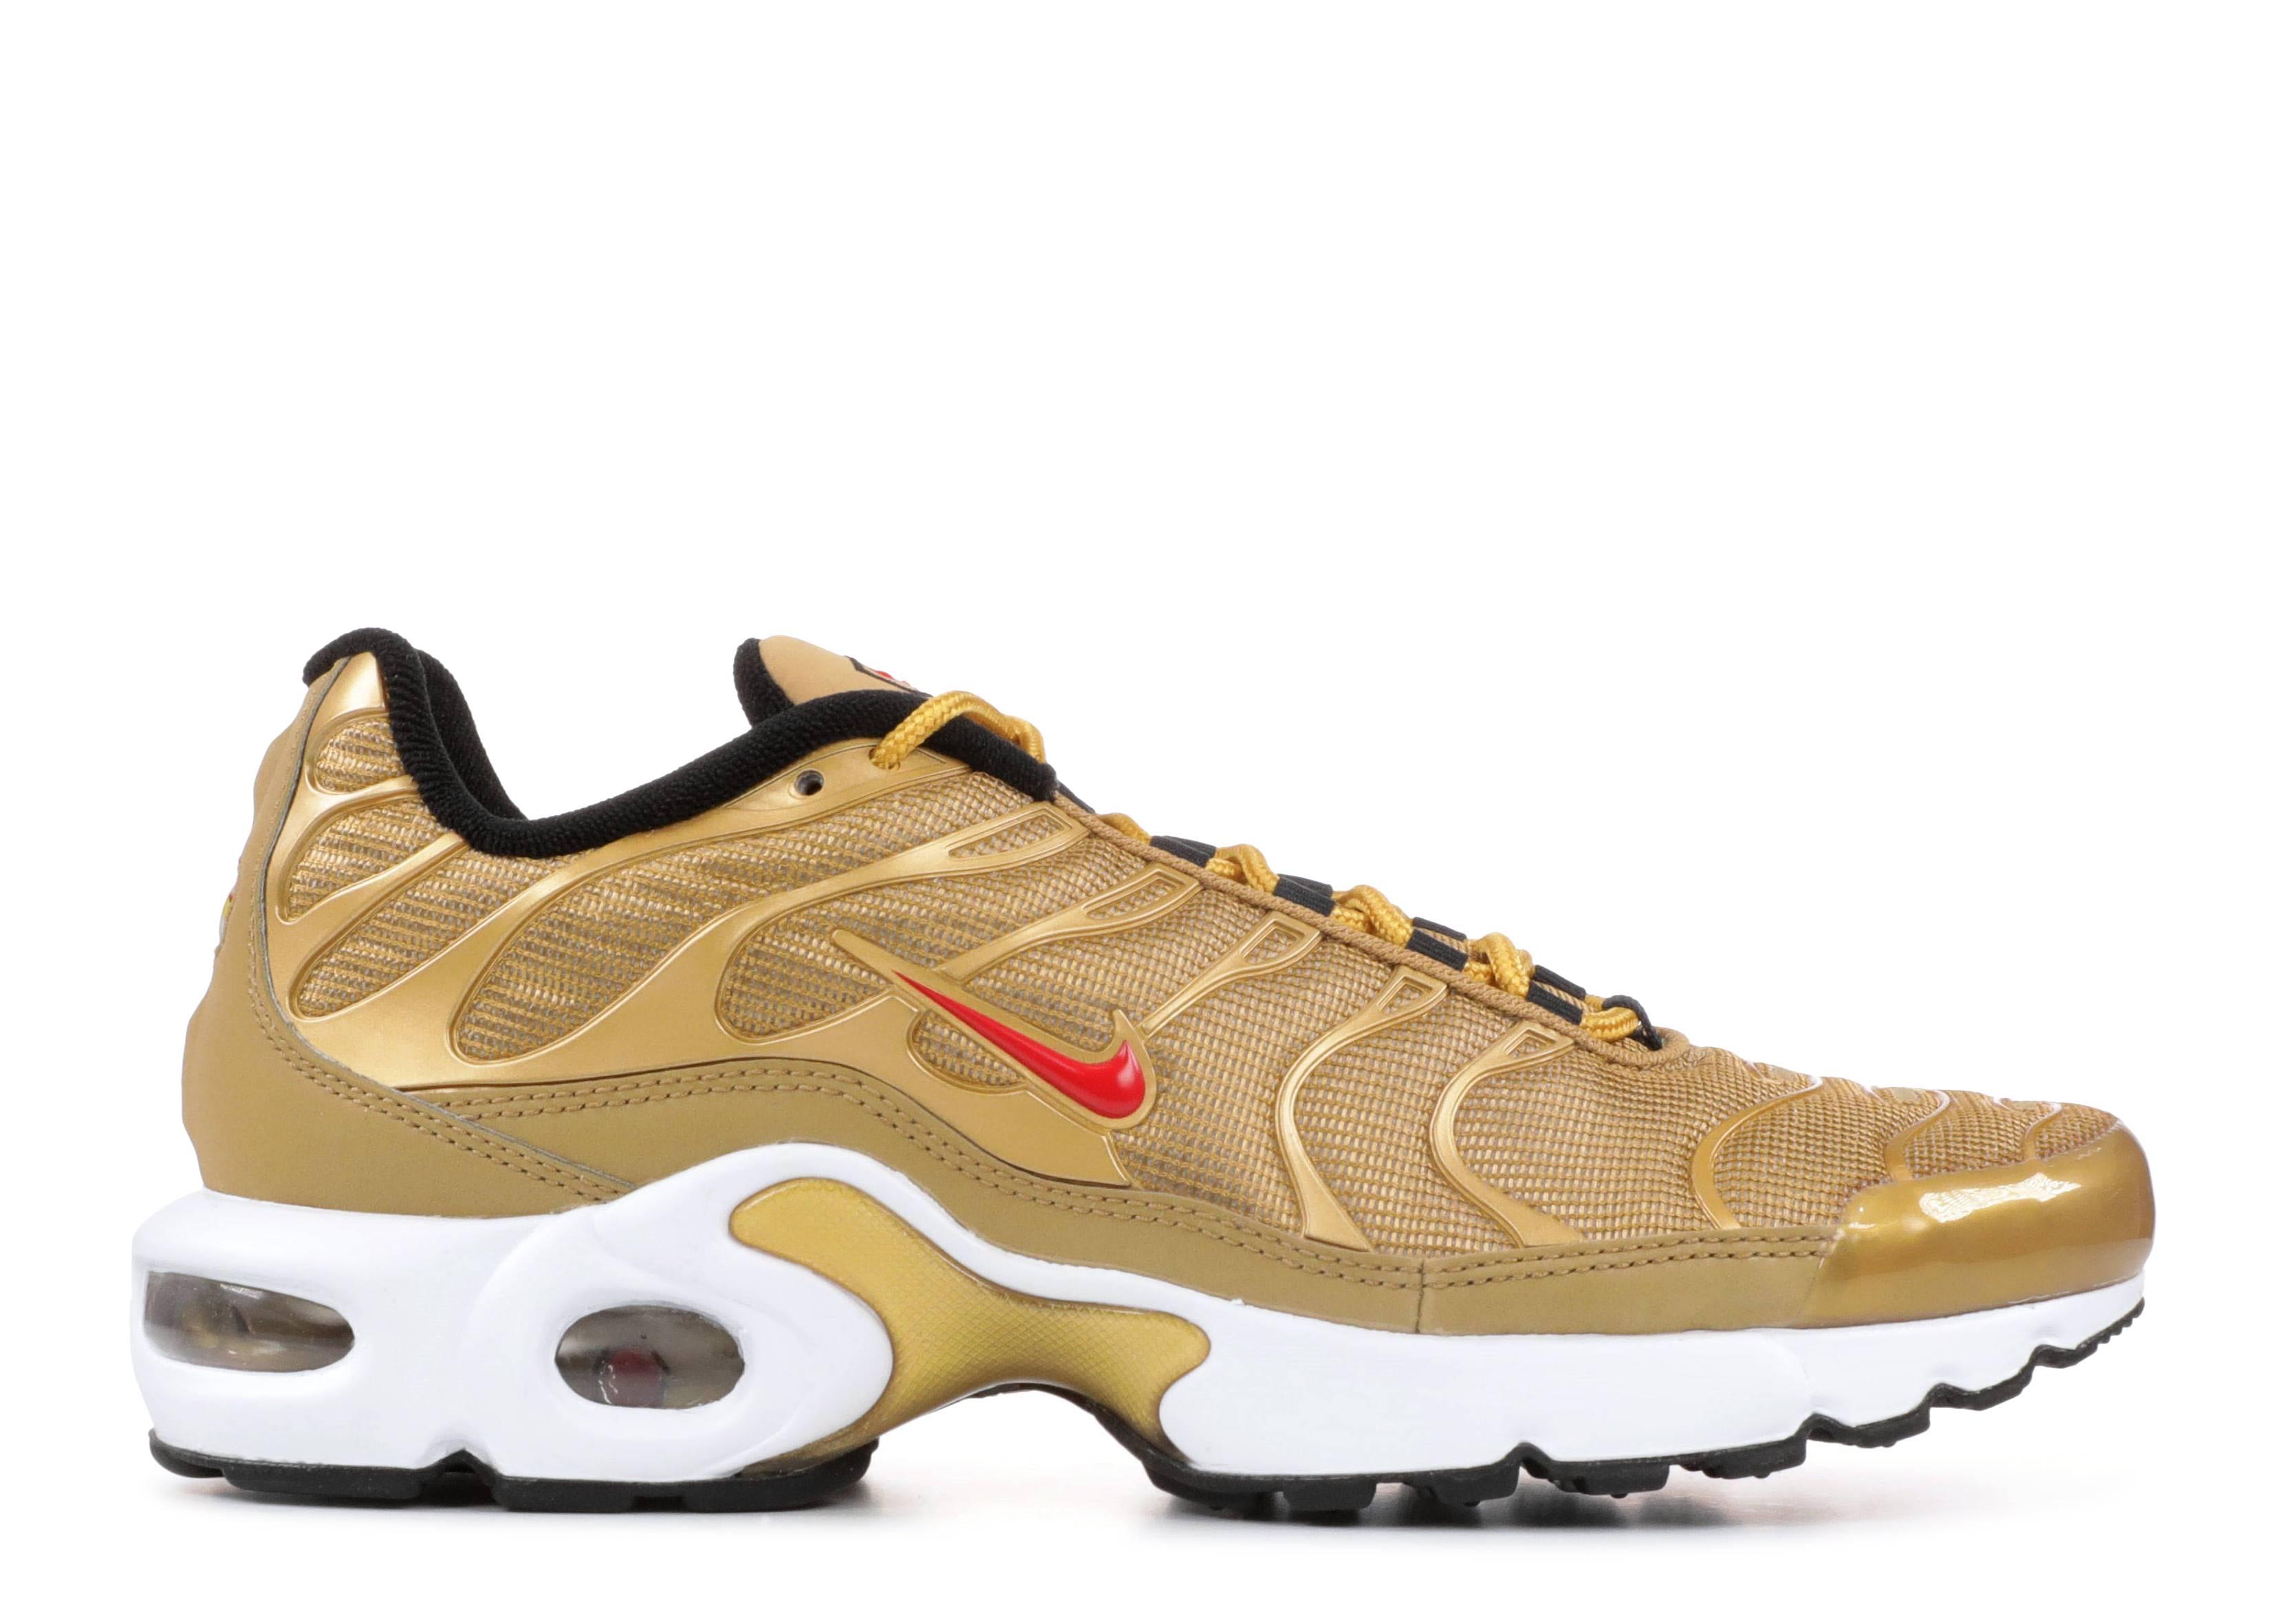 Persona con experiencia Coherente Sitio de Previs  Air Max Plus QS GS 'Metallic Gold' - Nike - AR0259 700 - metallic gold/university  red | Flight Club